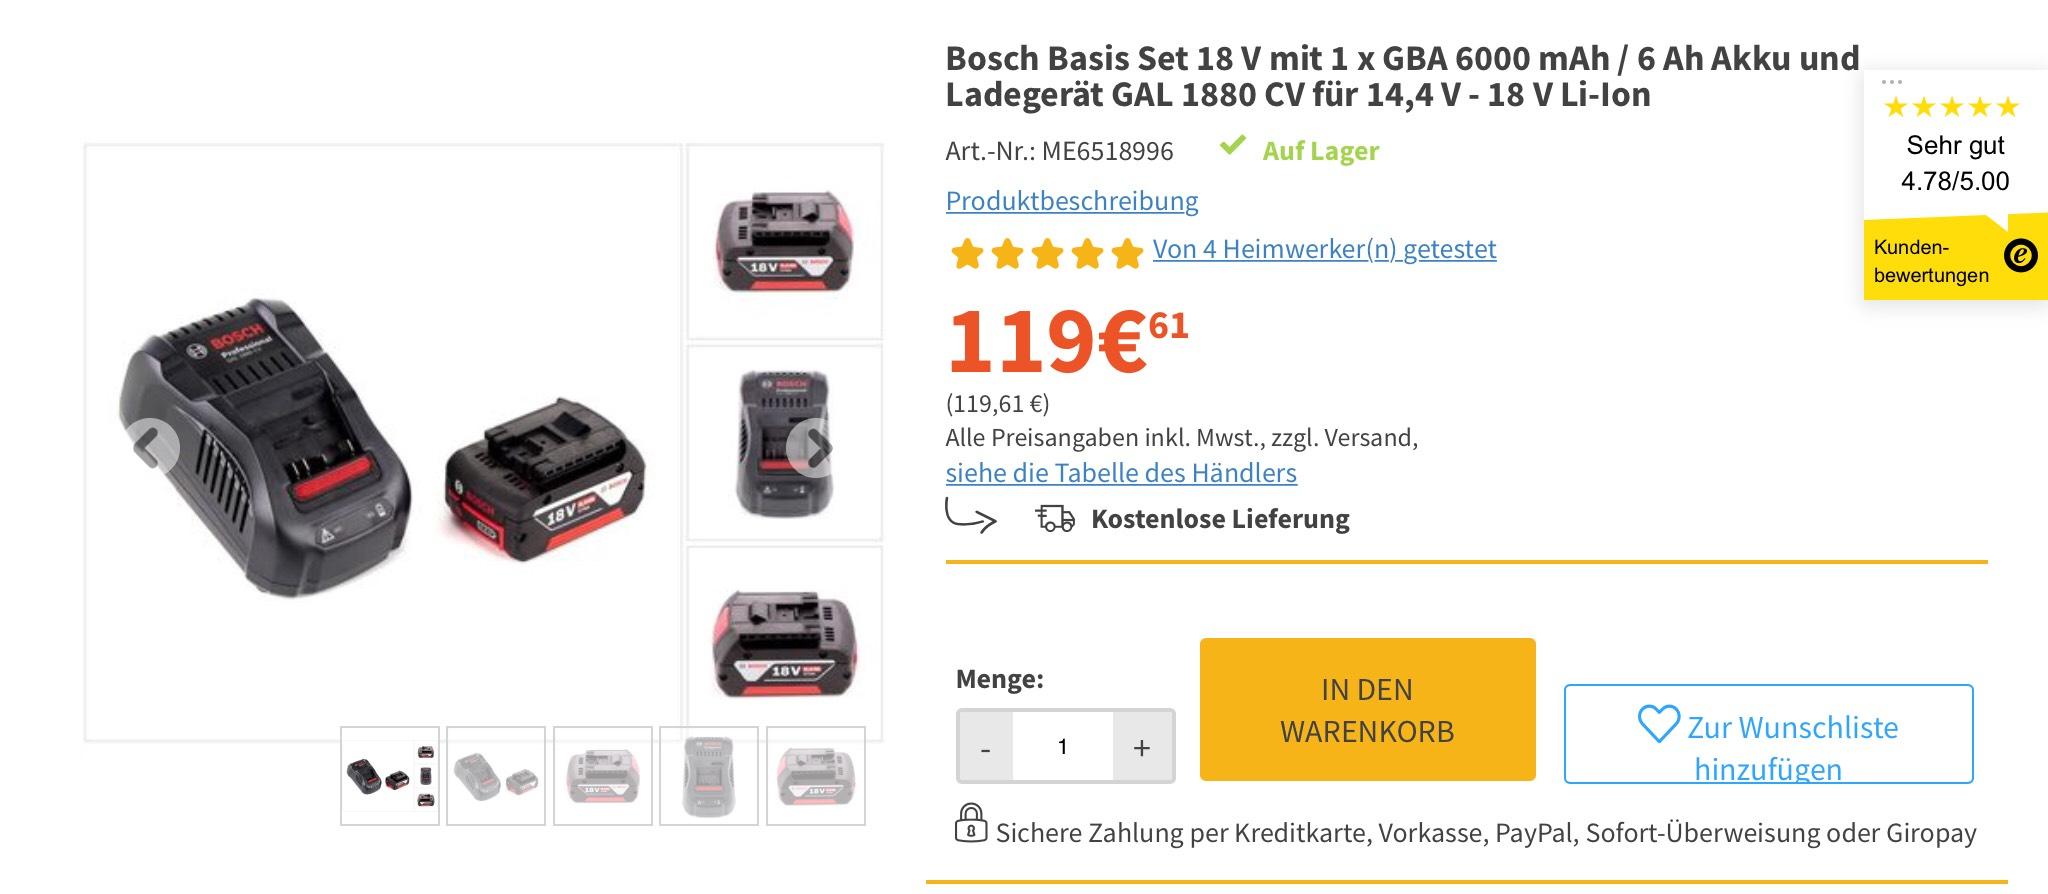 Bosch Basis Set 18 V mit 1 x GBA 6000 mAh / 6 Ah Akku und Ladegerät GAL 1880 CV für 14,4 V - 18 V Li-Ion